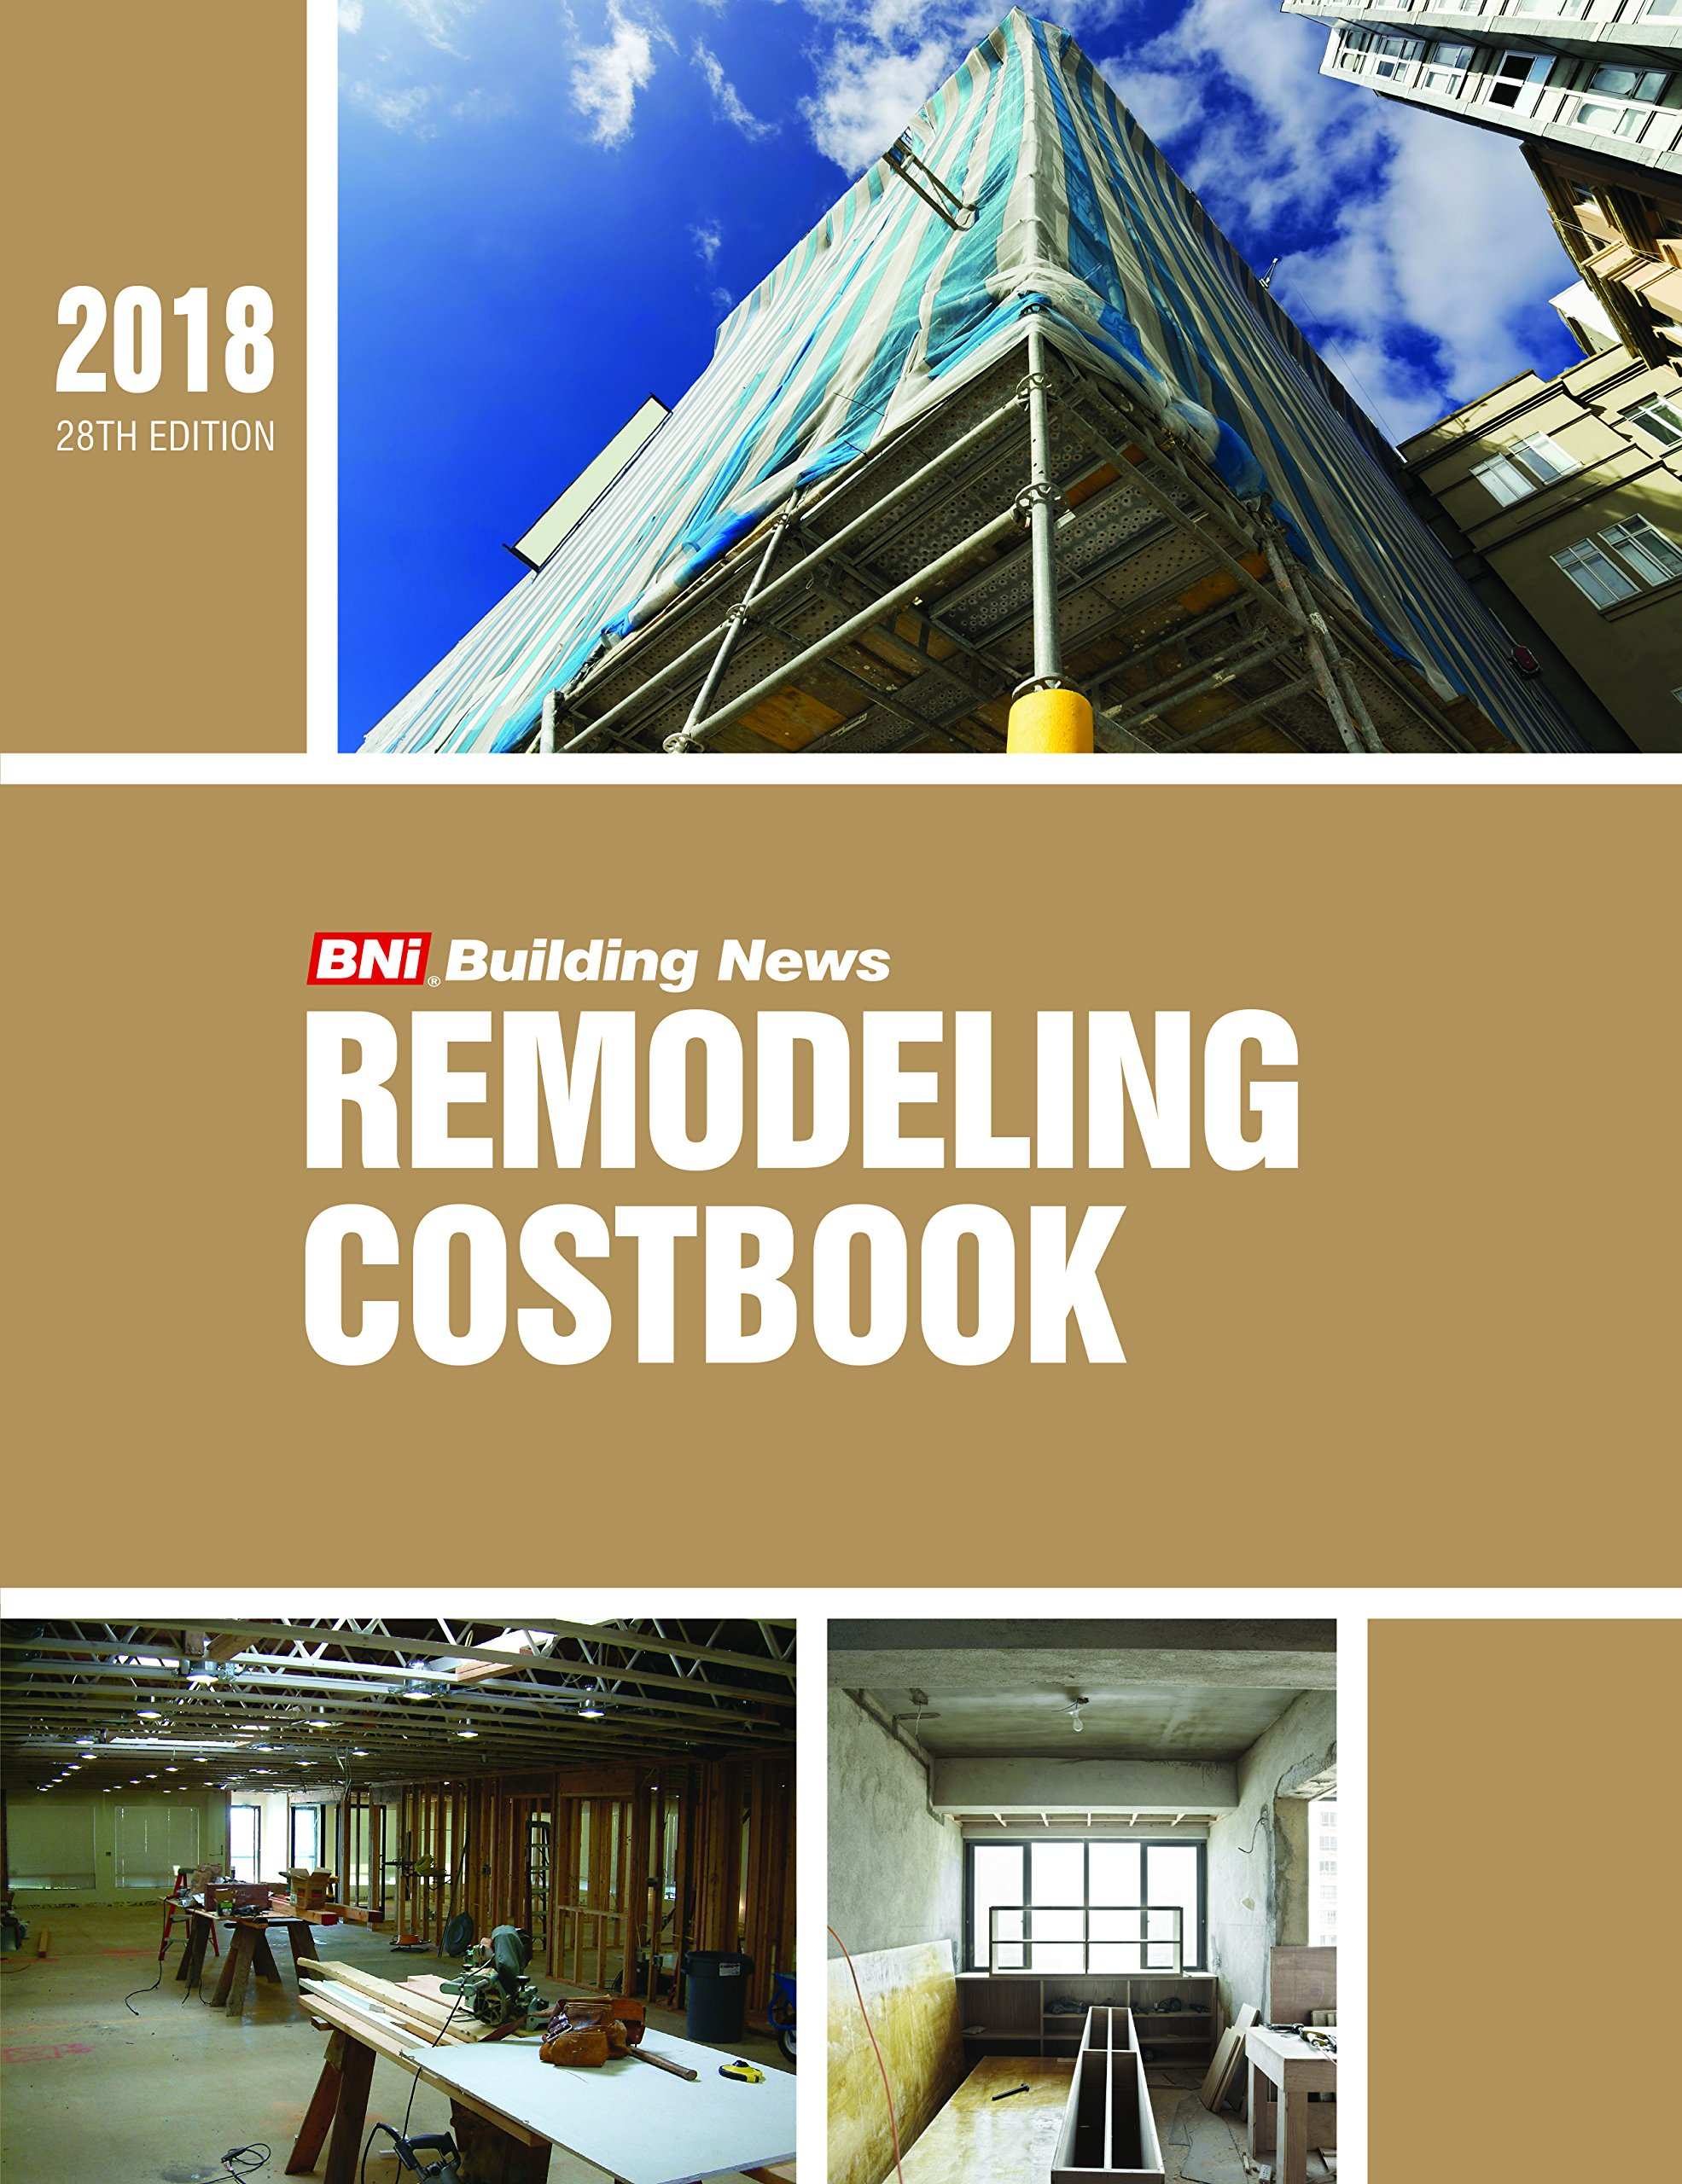 2018 Bni Public Works Costbook